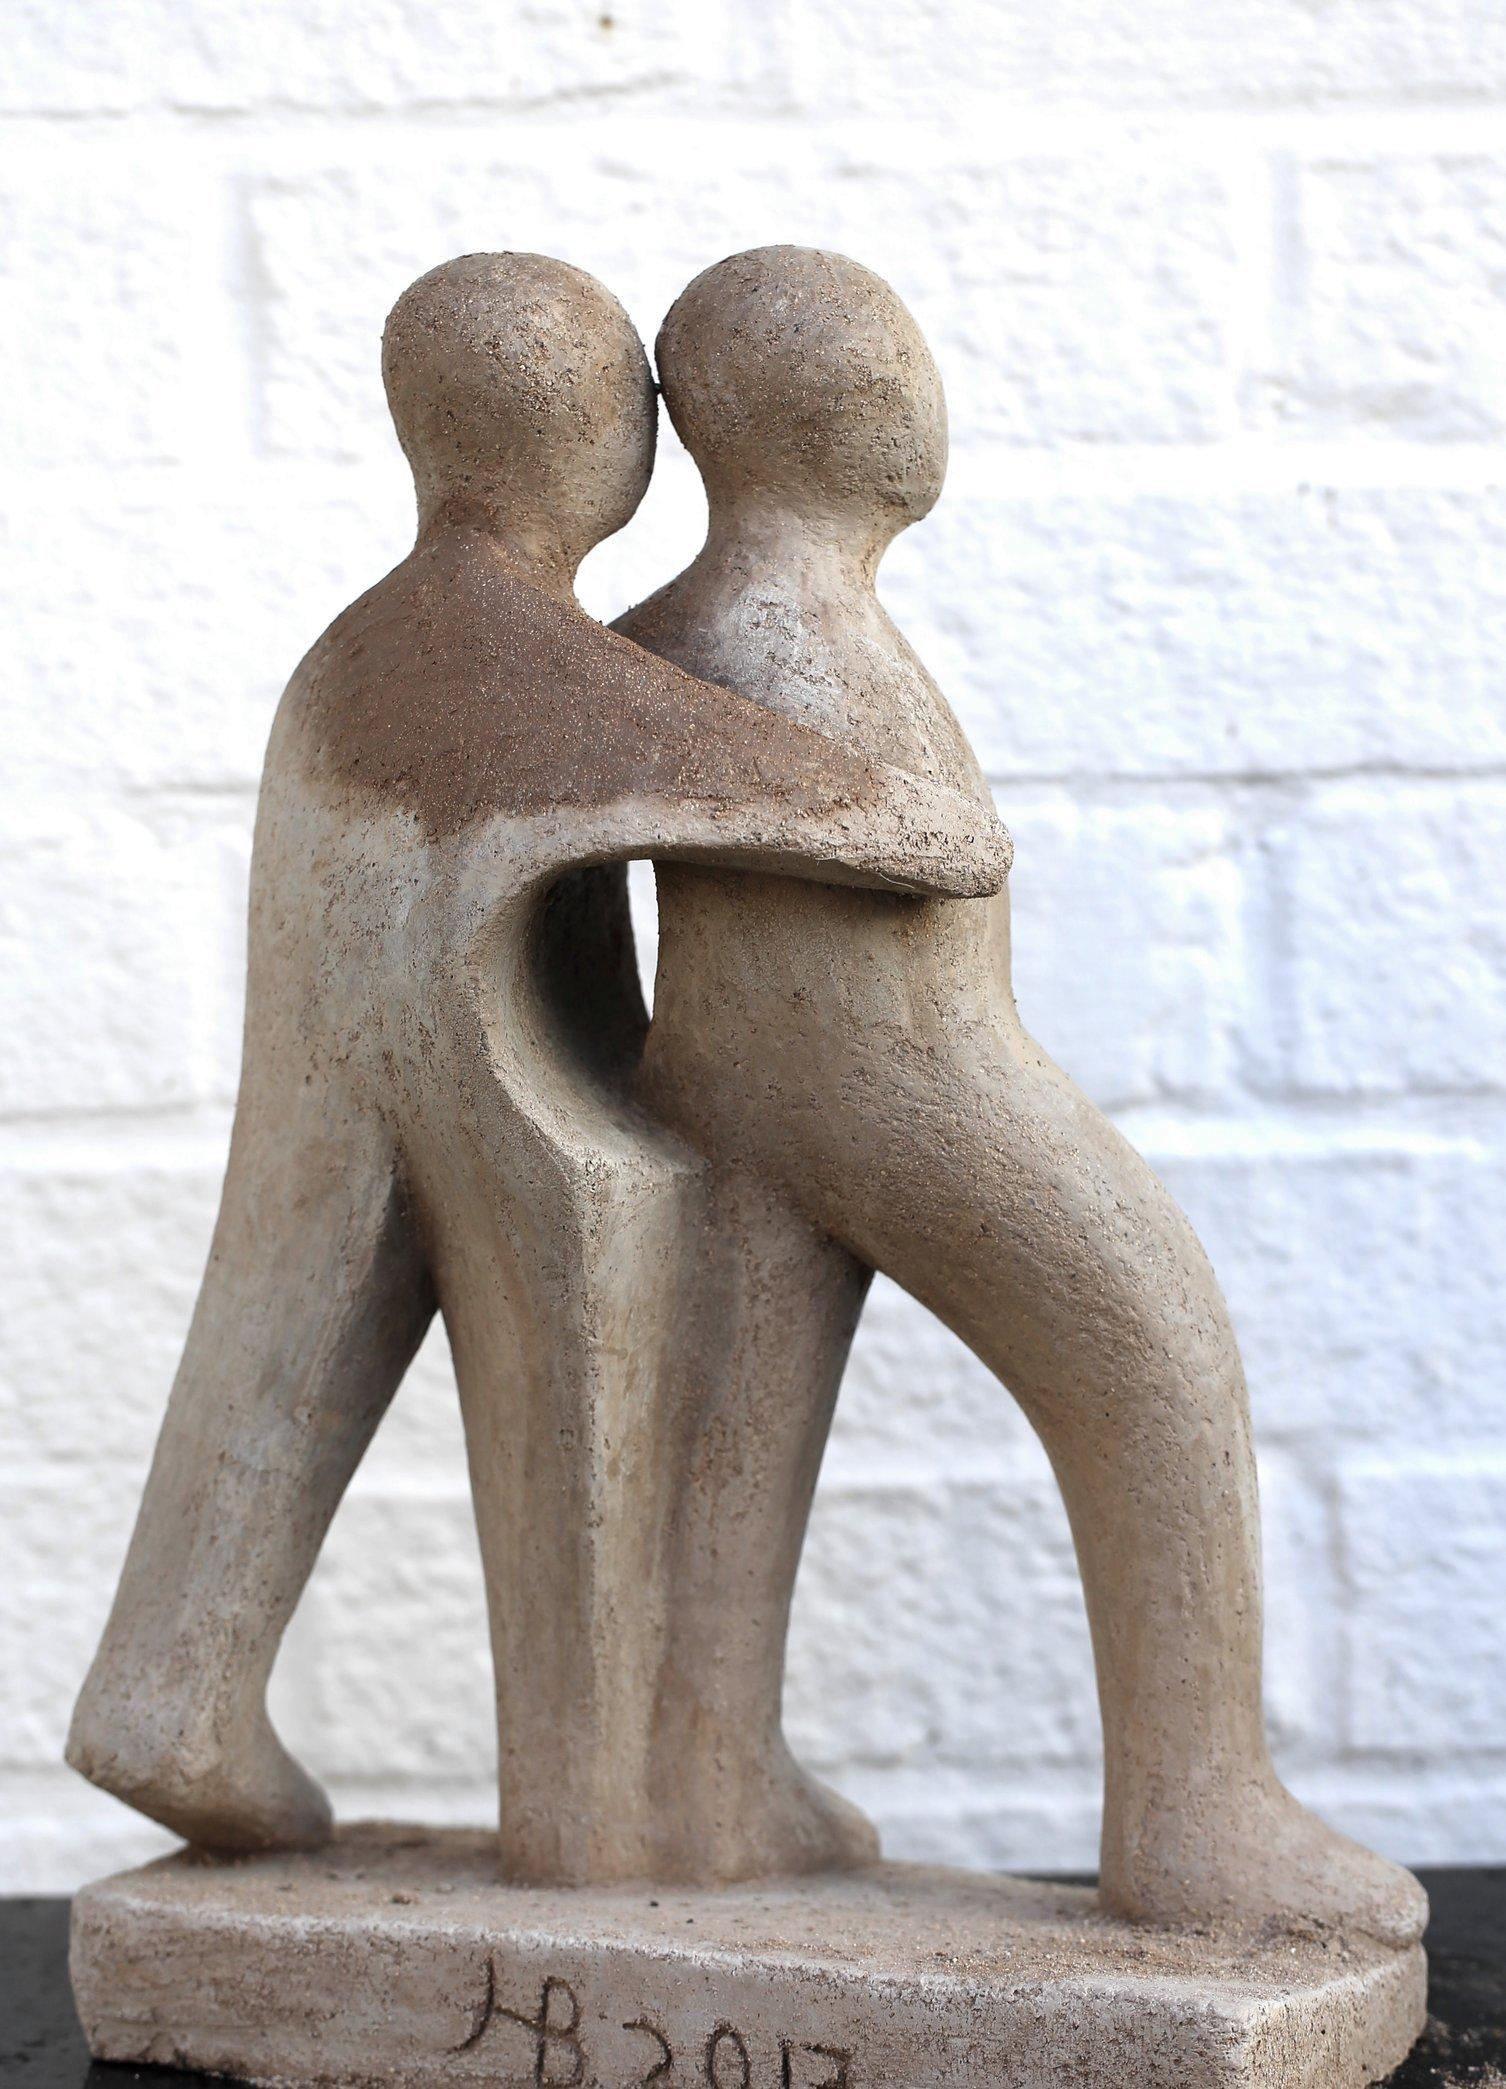 Maquette 3 ,30 cm high